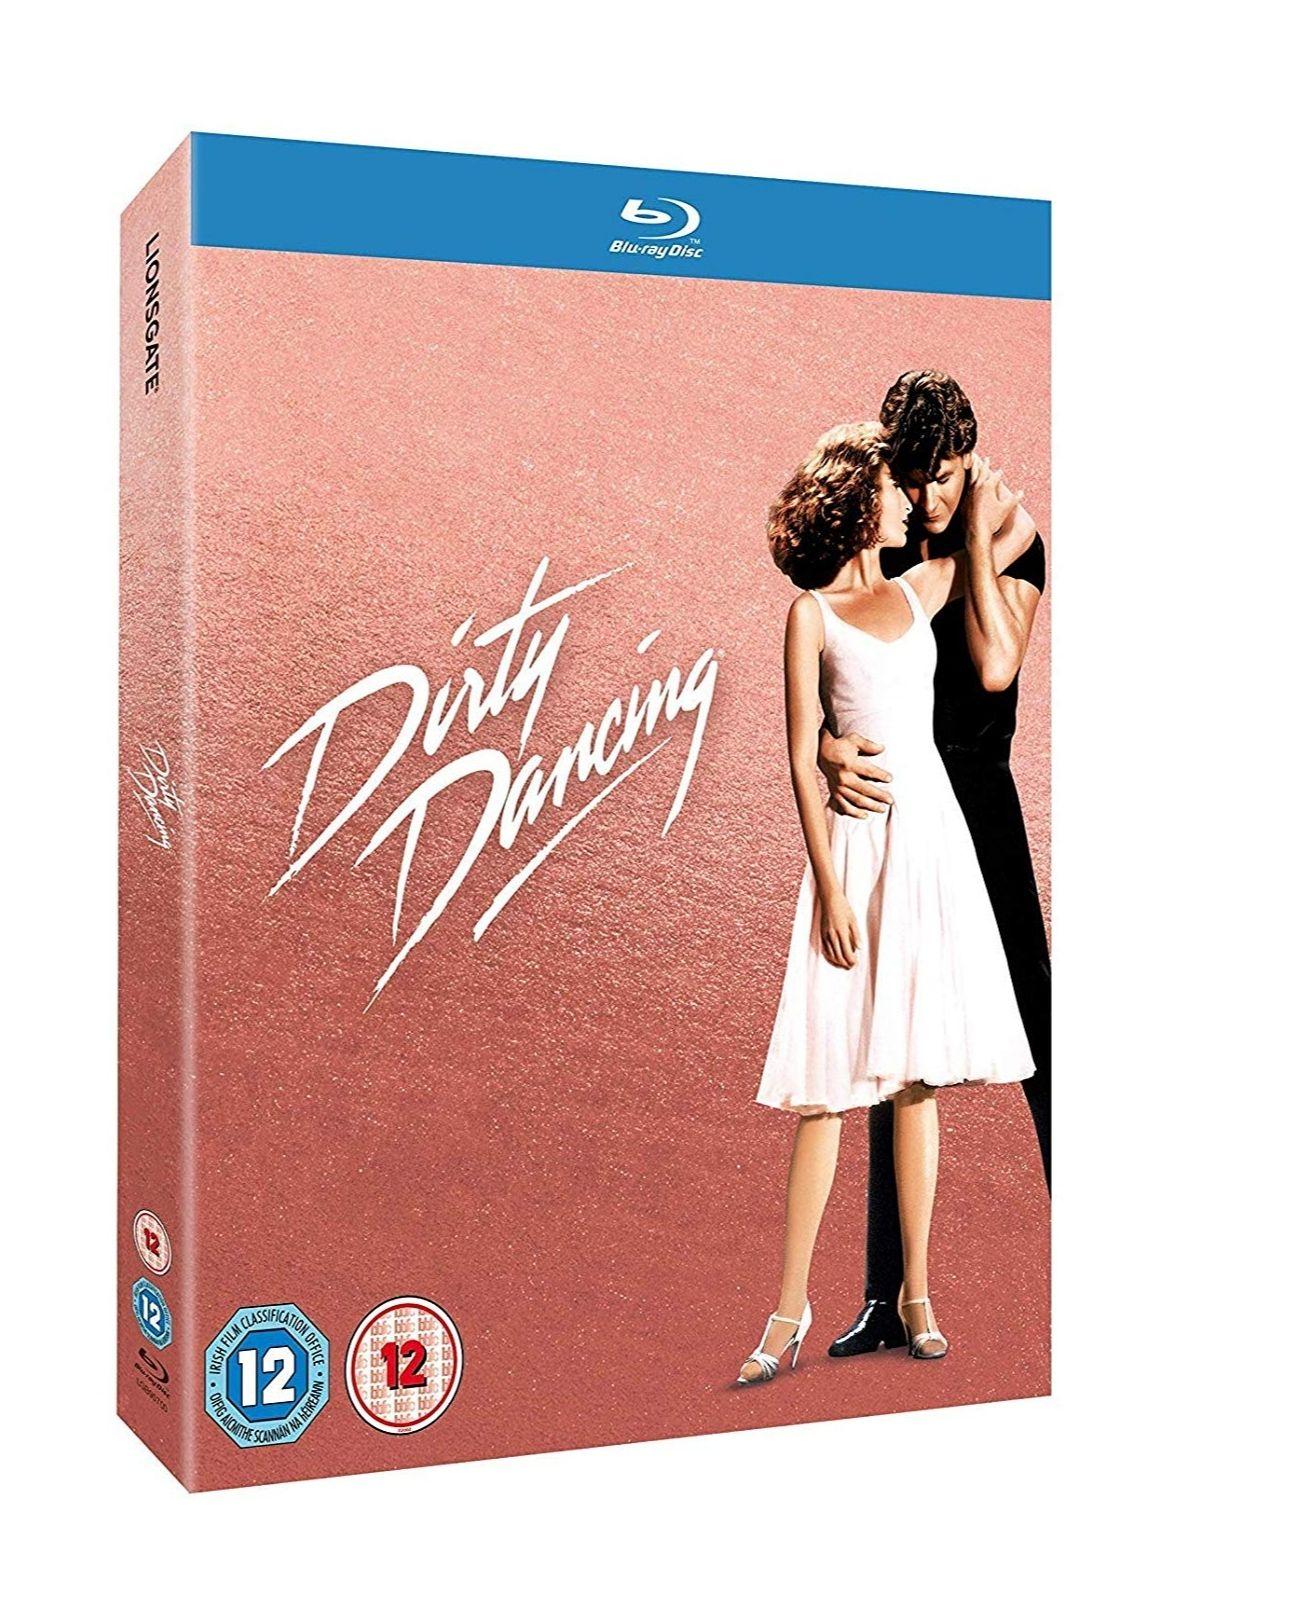 Dirty Dancing Blu ray £4.41 + £2.99 non prime at Amazon